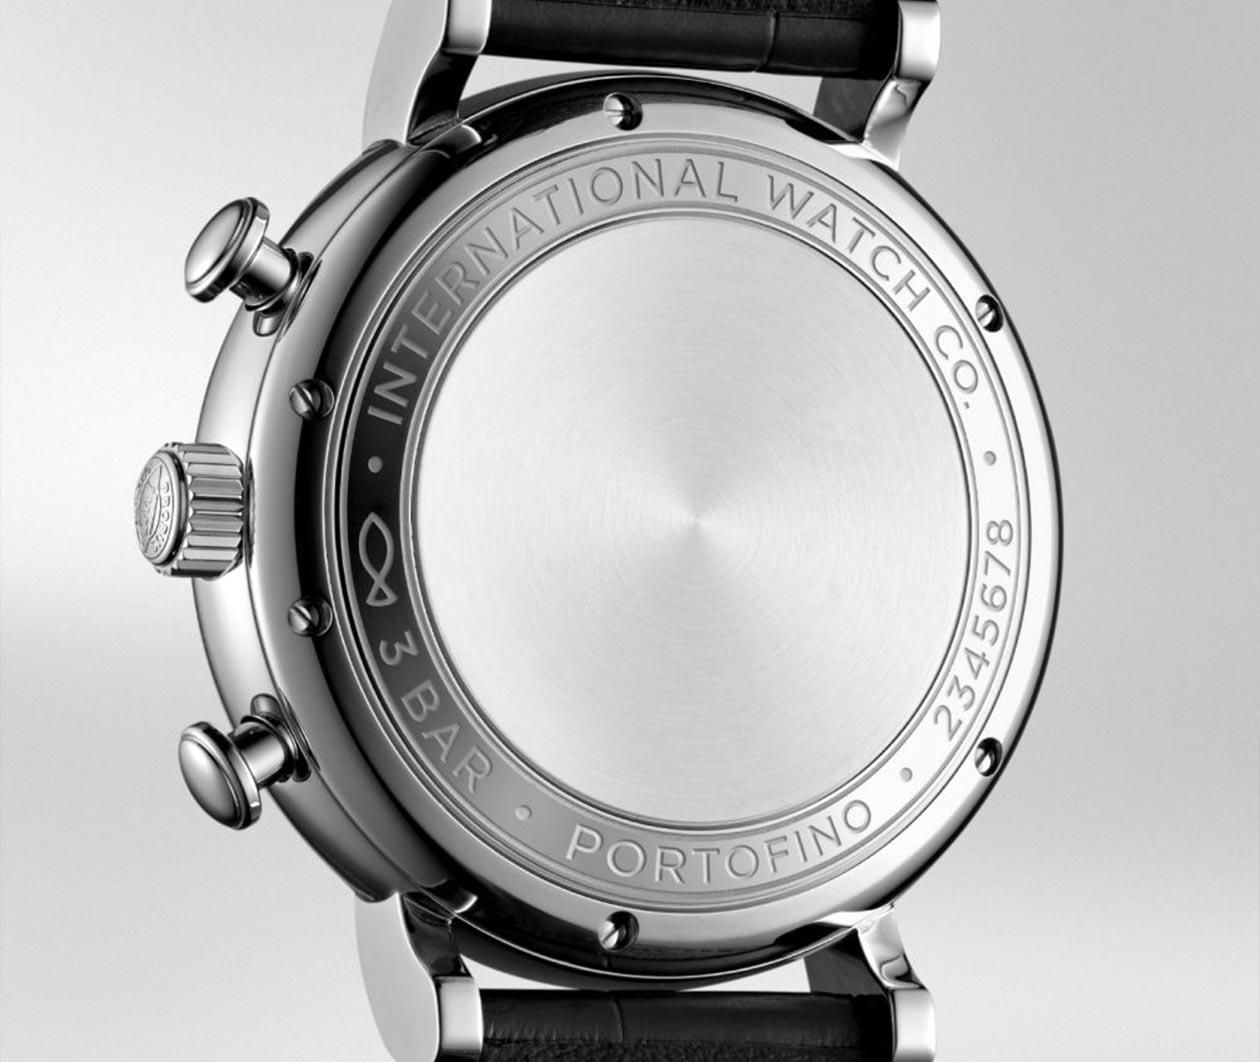 IWC Portofino Chronograph IW391029 Carousel 5 FINAL